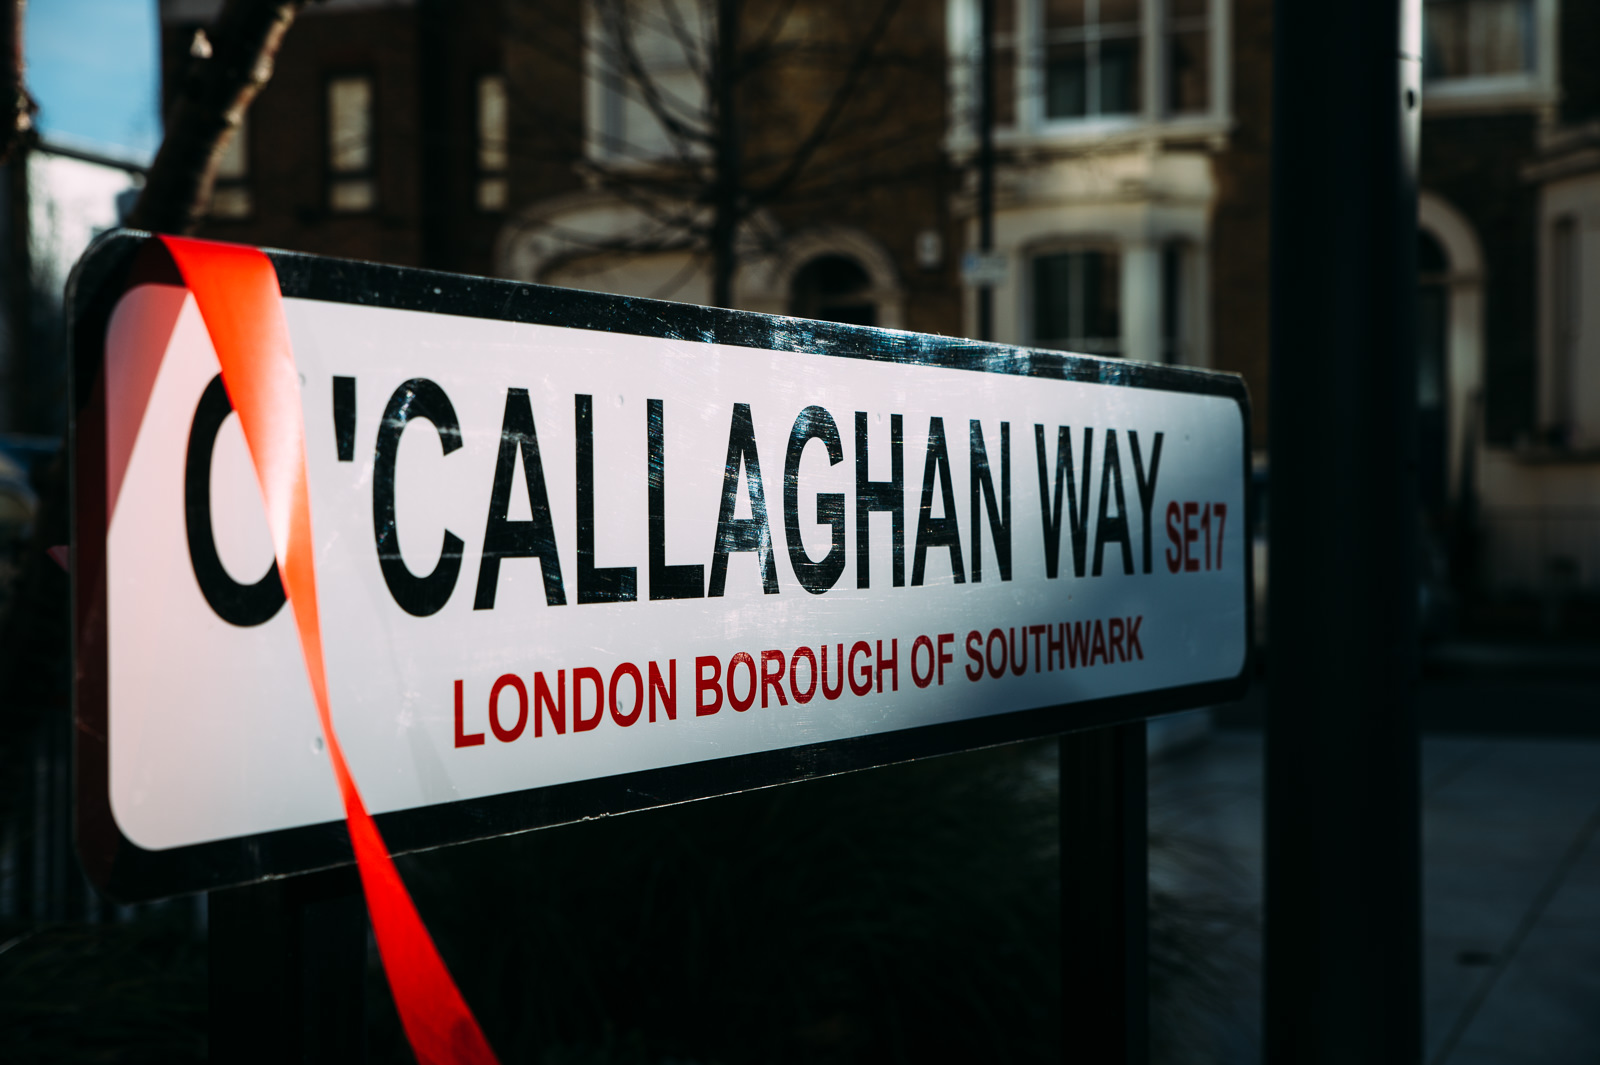 o'callaghan way road sign